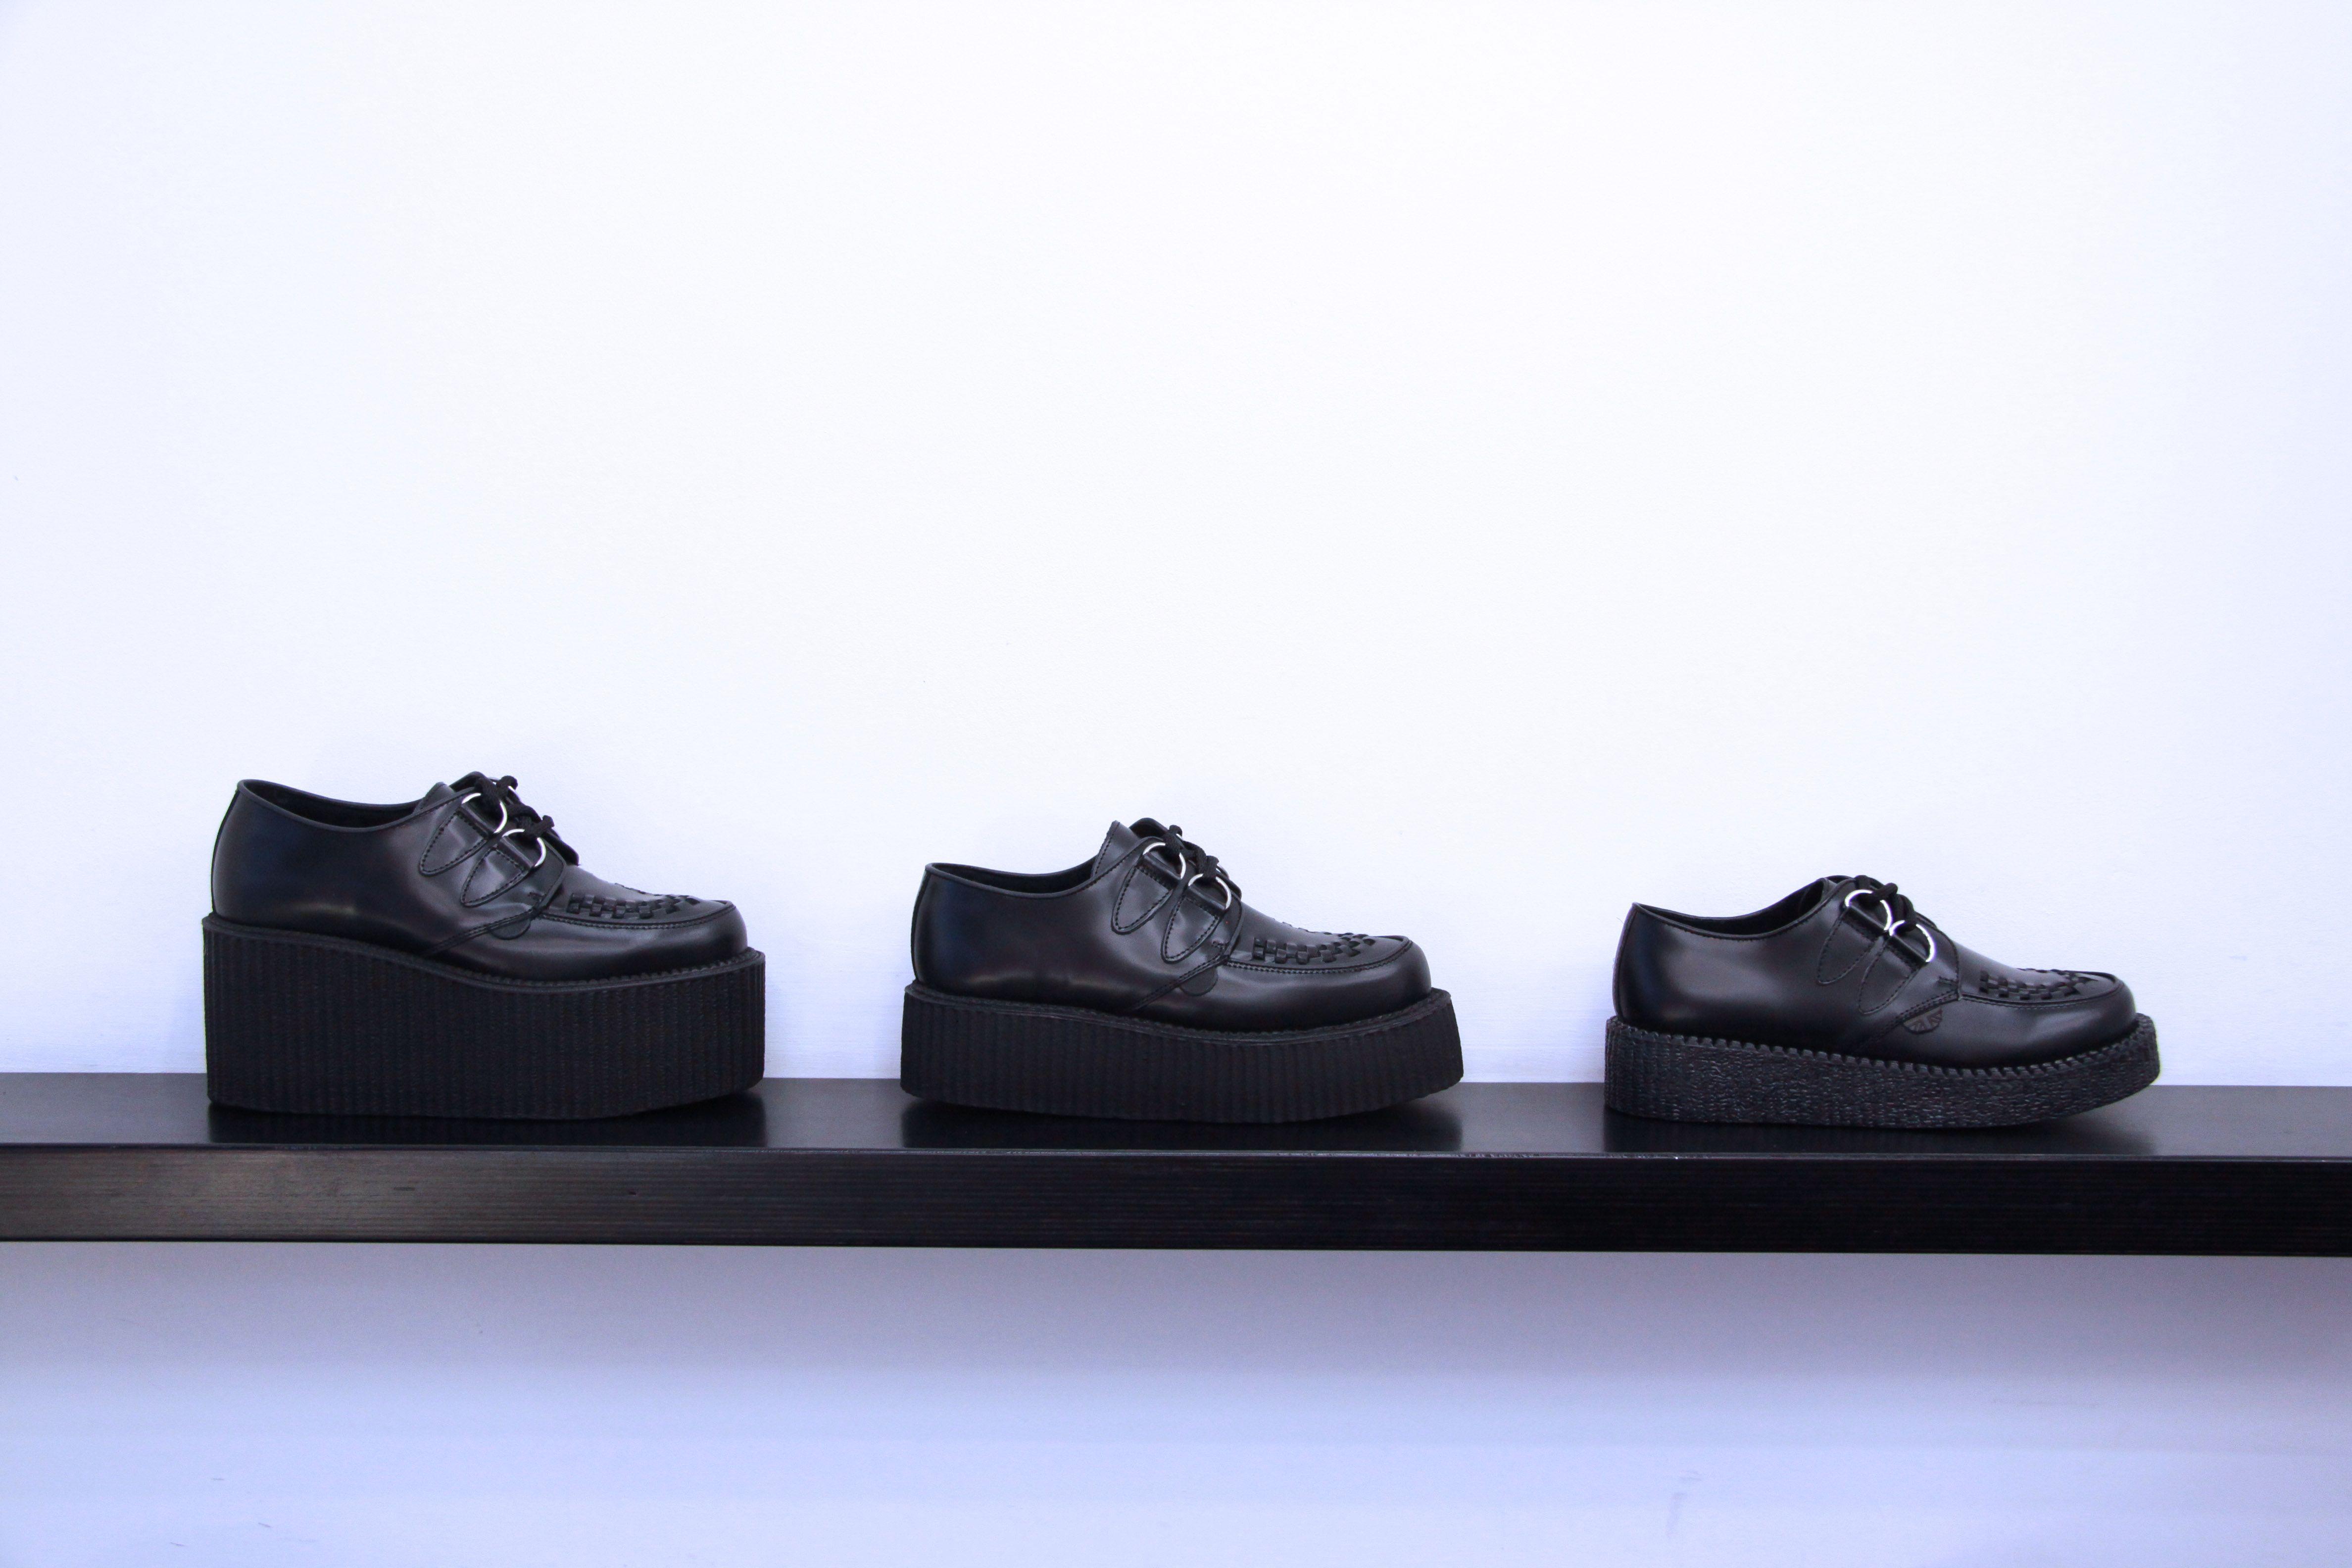 48c71325661 UNDERGROUND SHOES. The Original Wulfrun Creeper. Black Leather Creeper Shoes  in Triple